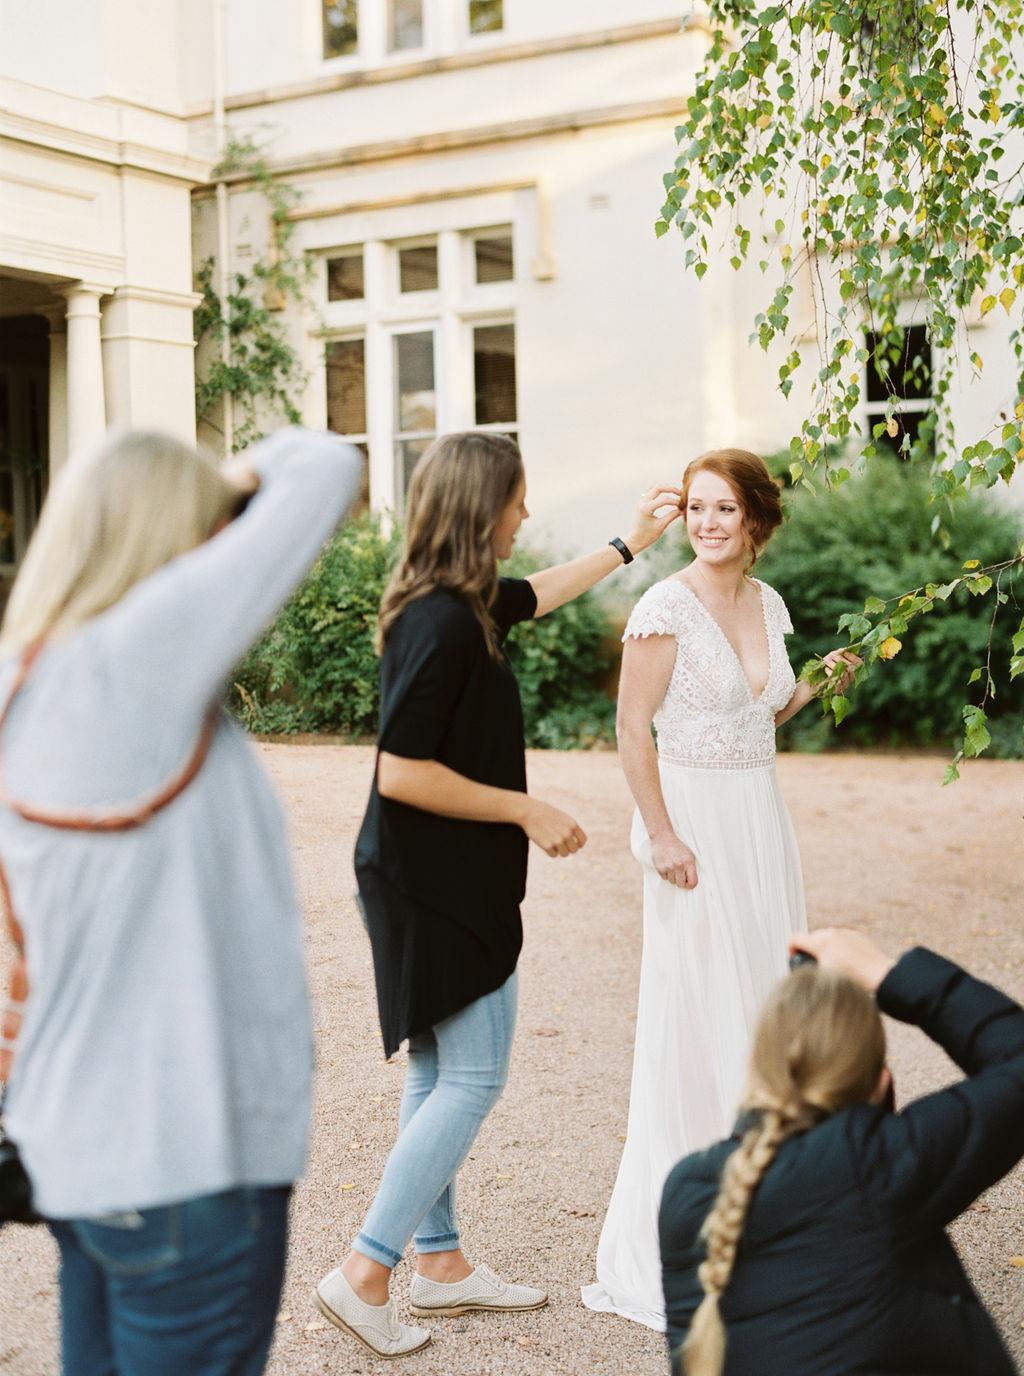 Bowral Southern Highlands Wedding Photographer Sheri McMahon Fine Art Film Sydney wedding photographer